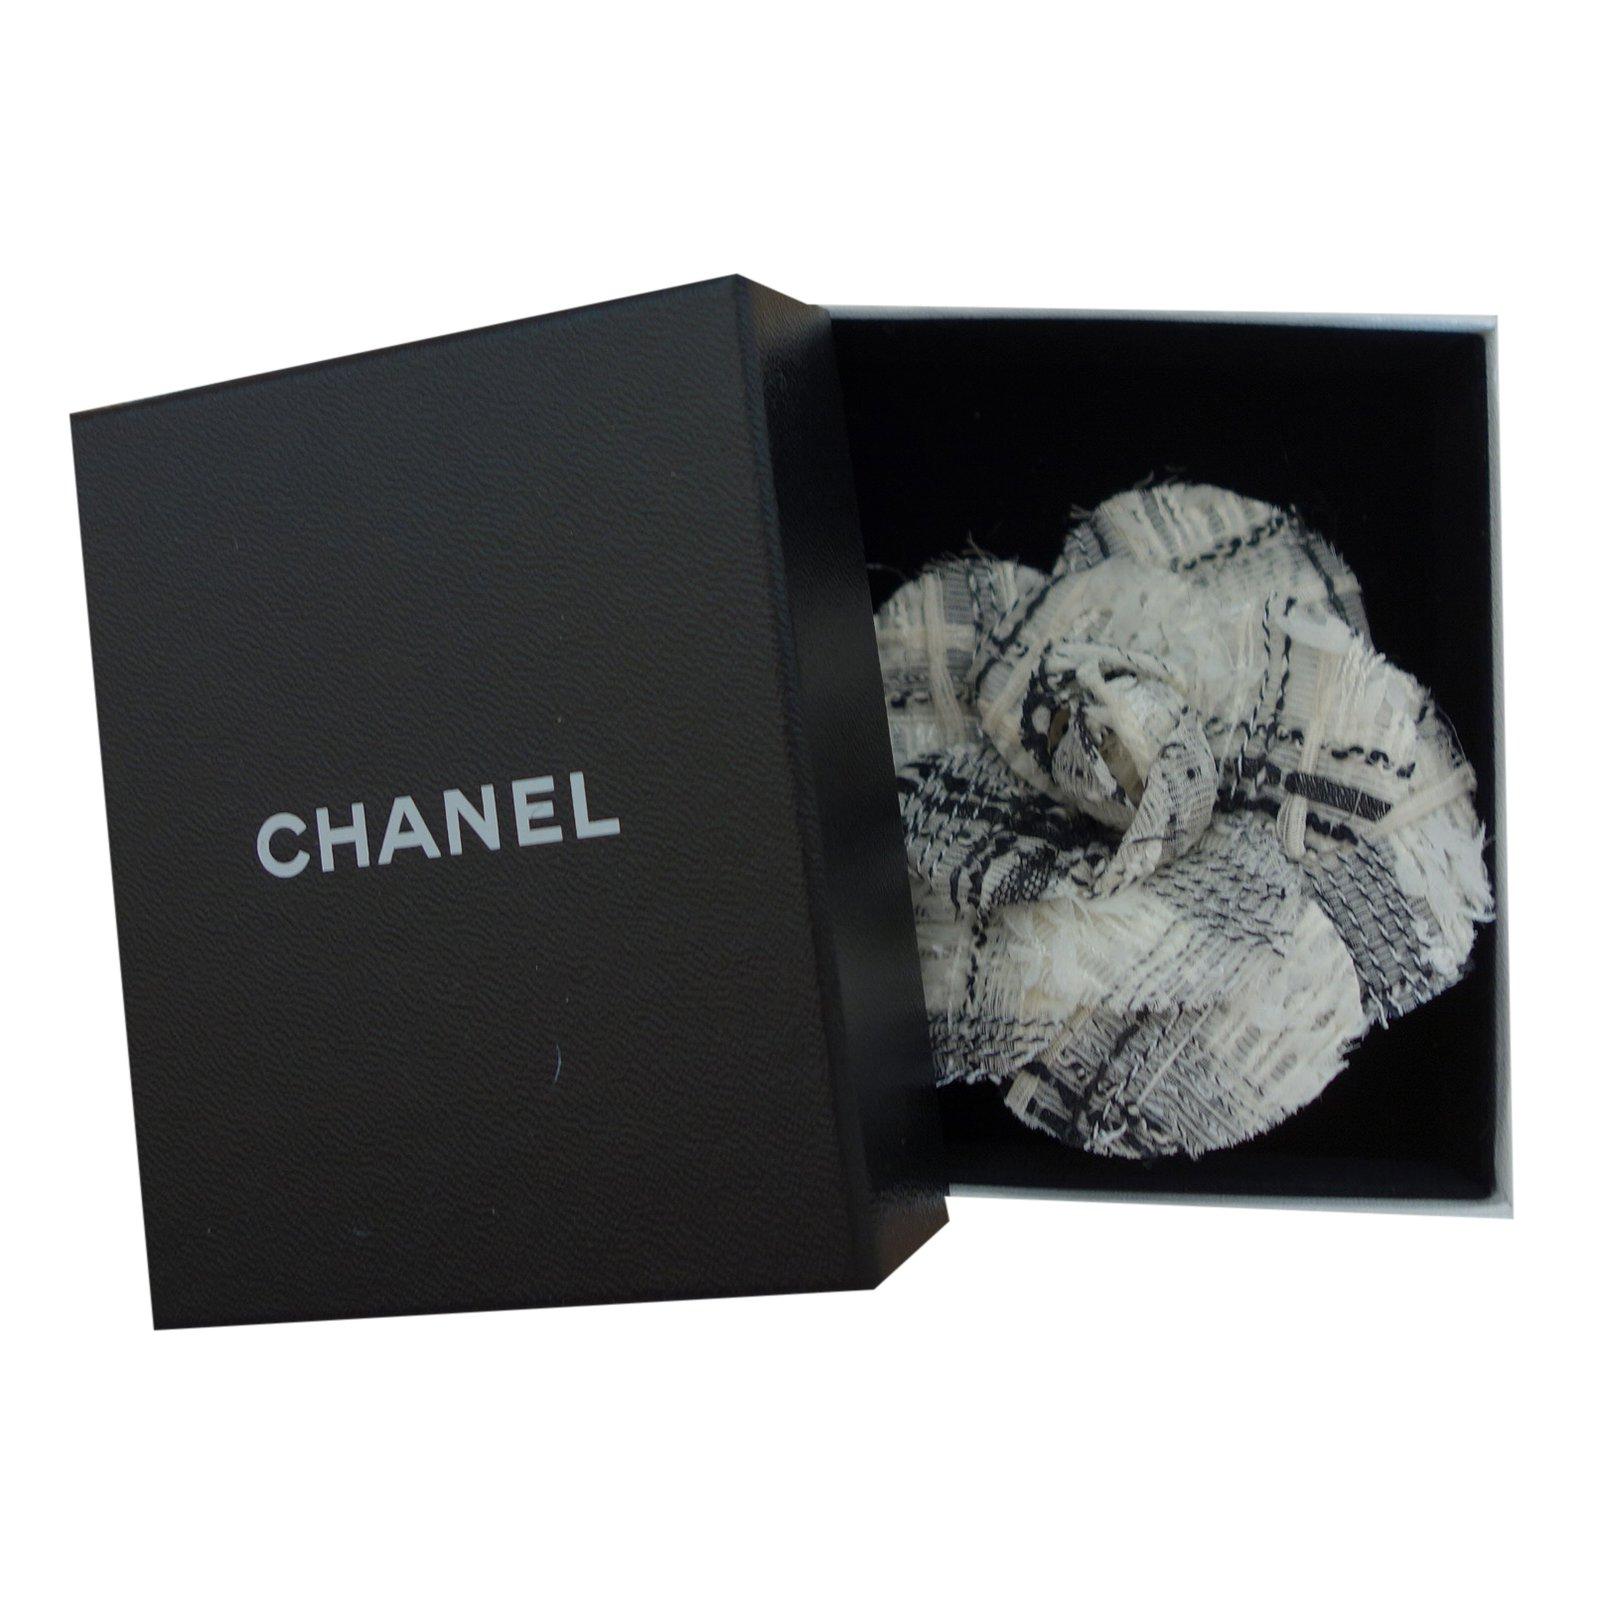 aa2649692f83 Broches Chanel Broche camélia tweed Tweed Écru ref.22566 - Joli Closet